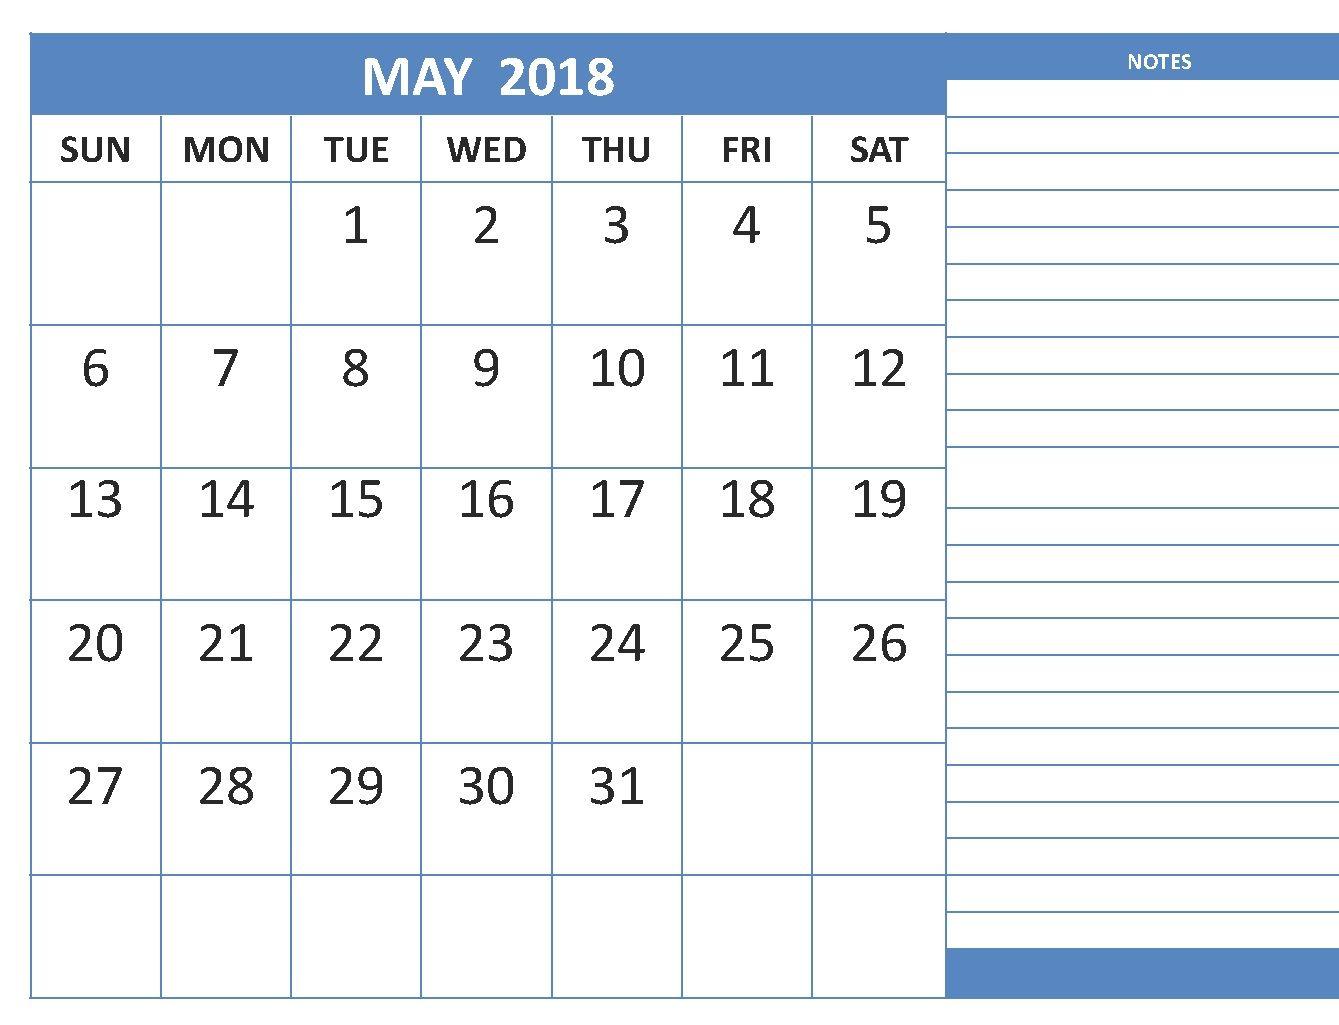 may 2018 blank calendar template